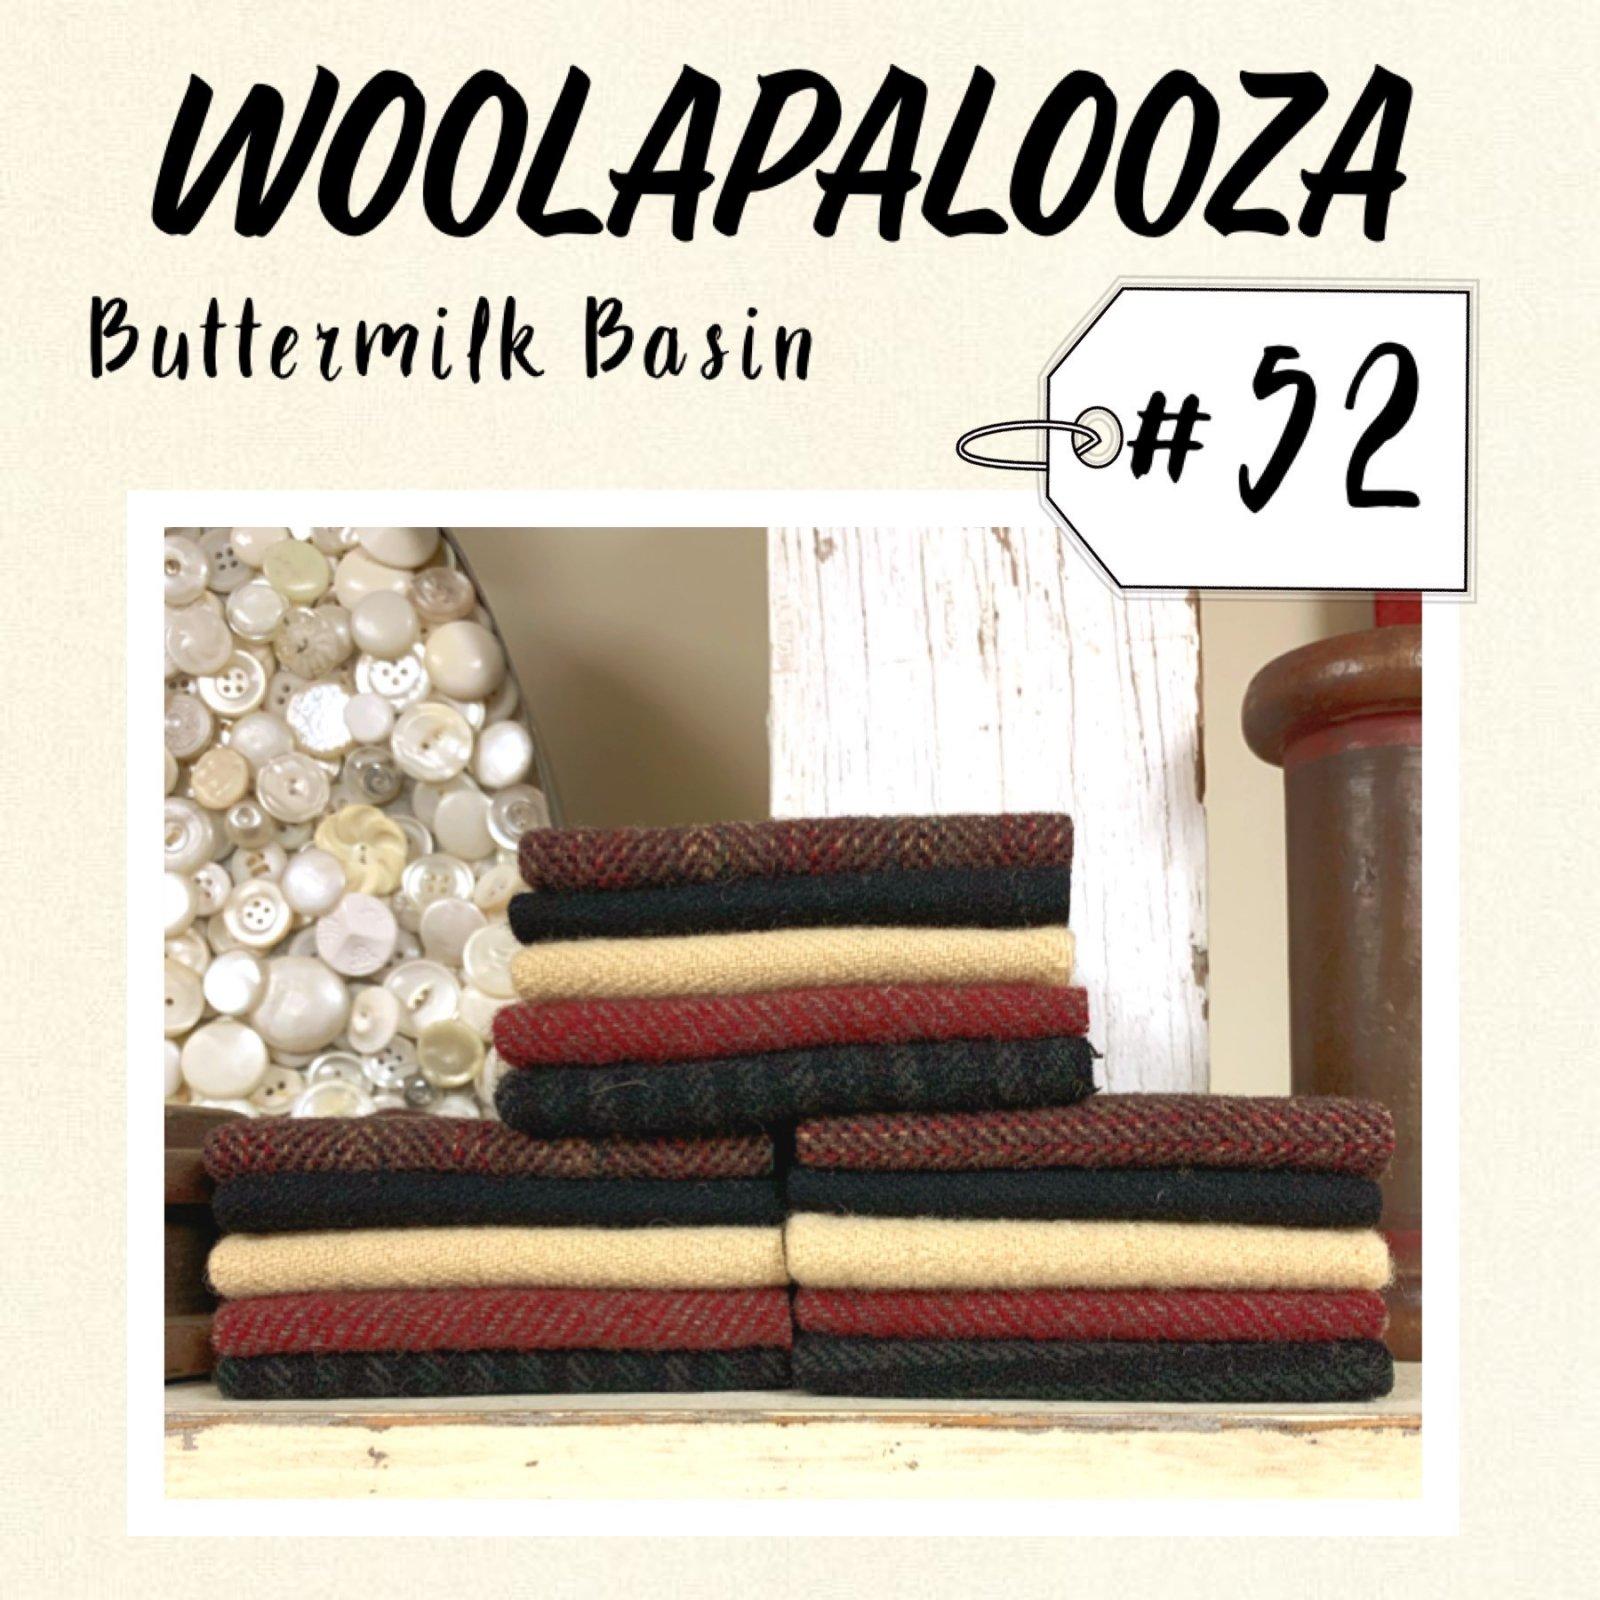 Woolapalooza #52 Wool Bundle